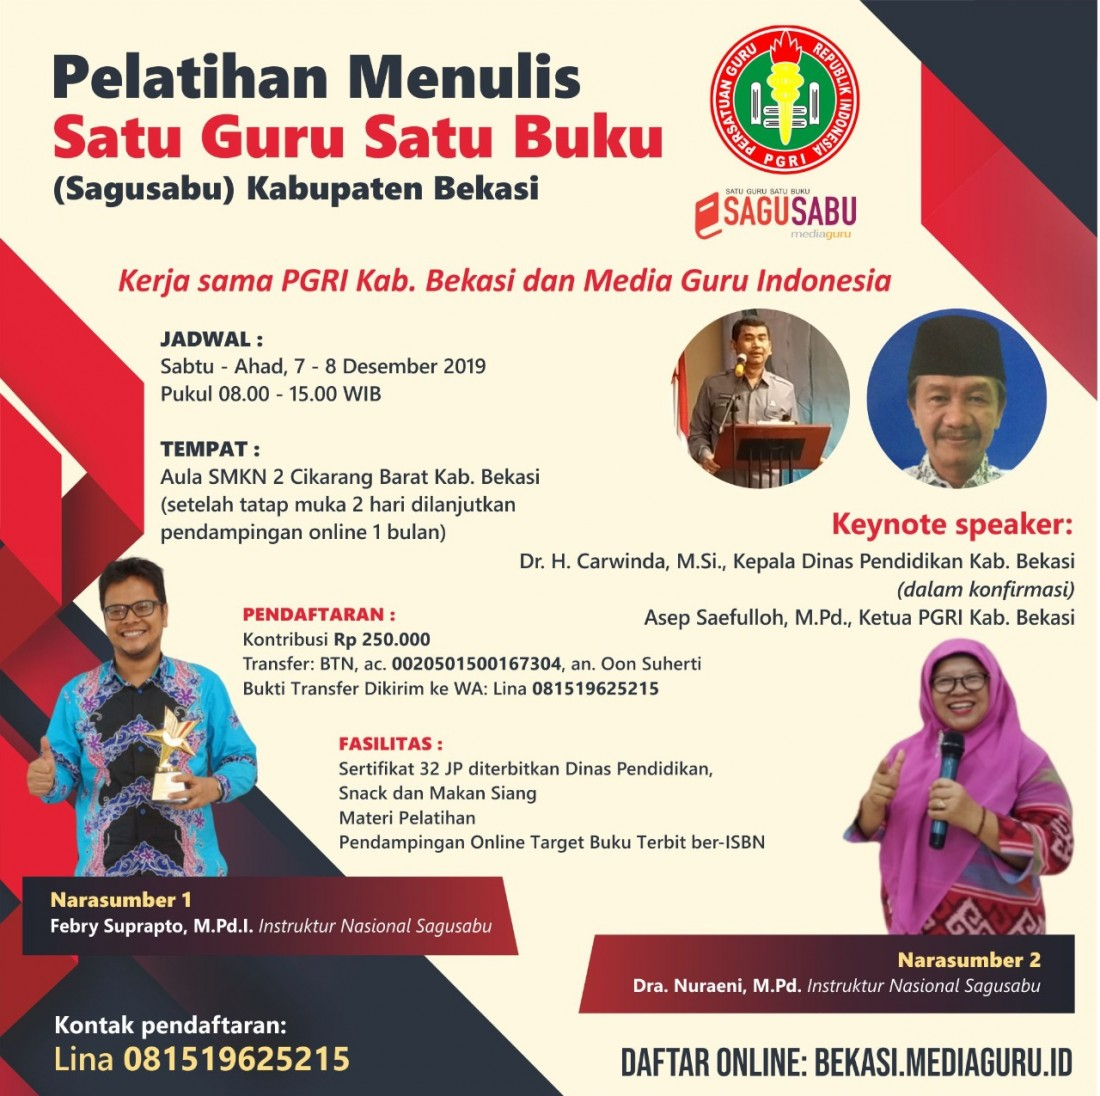 Pelatihan Menulis Sagusabu PGRI Kab. Bekasi (7-8 Desember 2019)